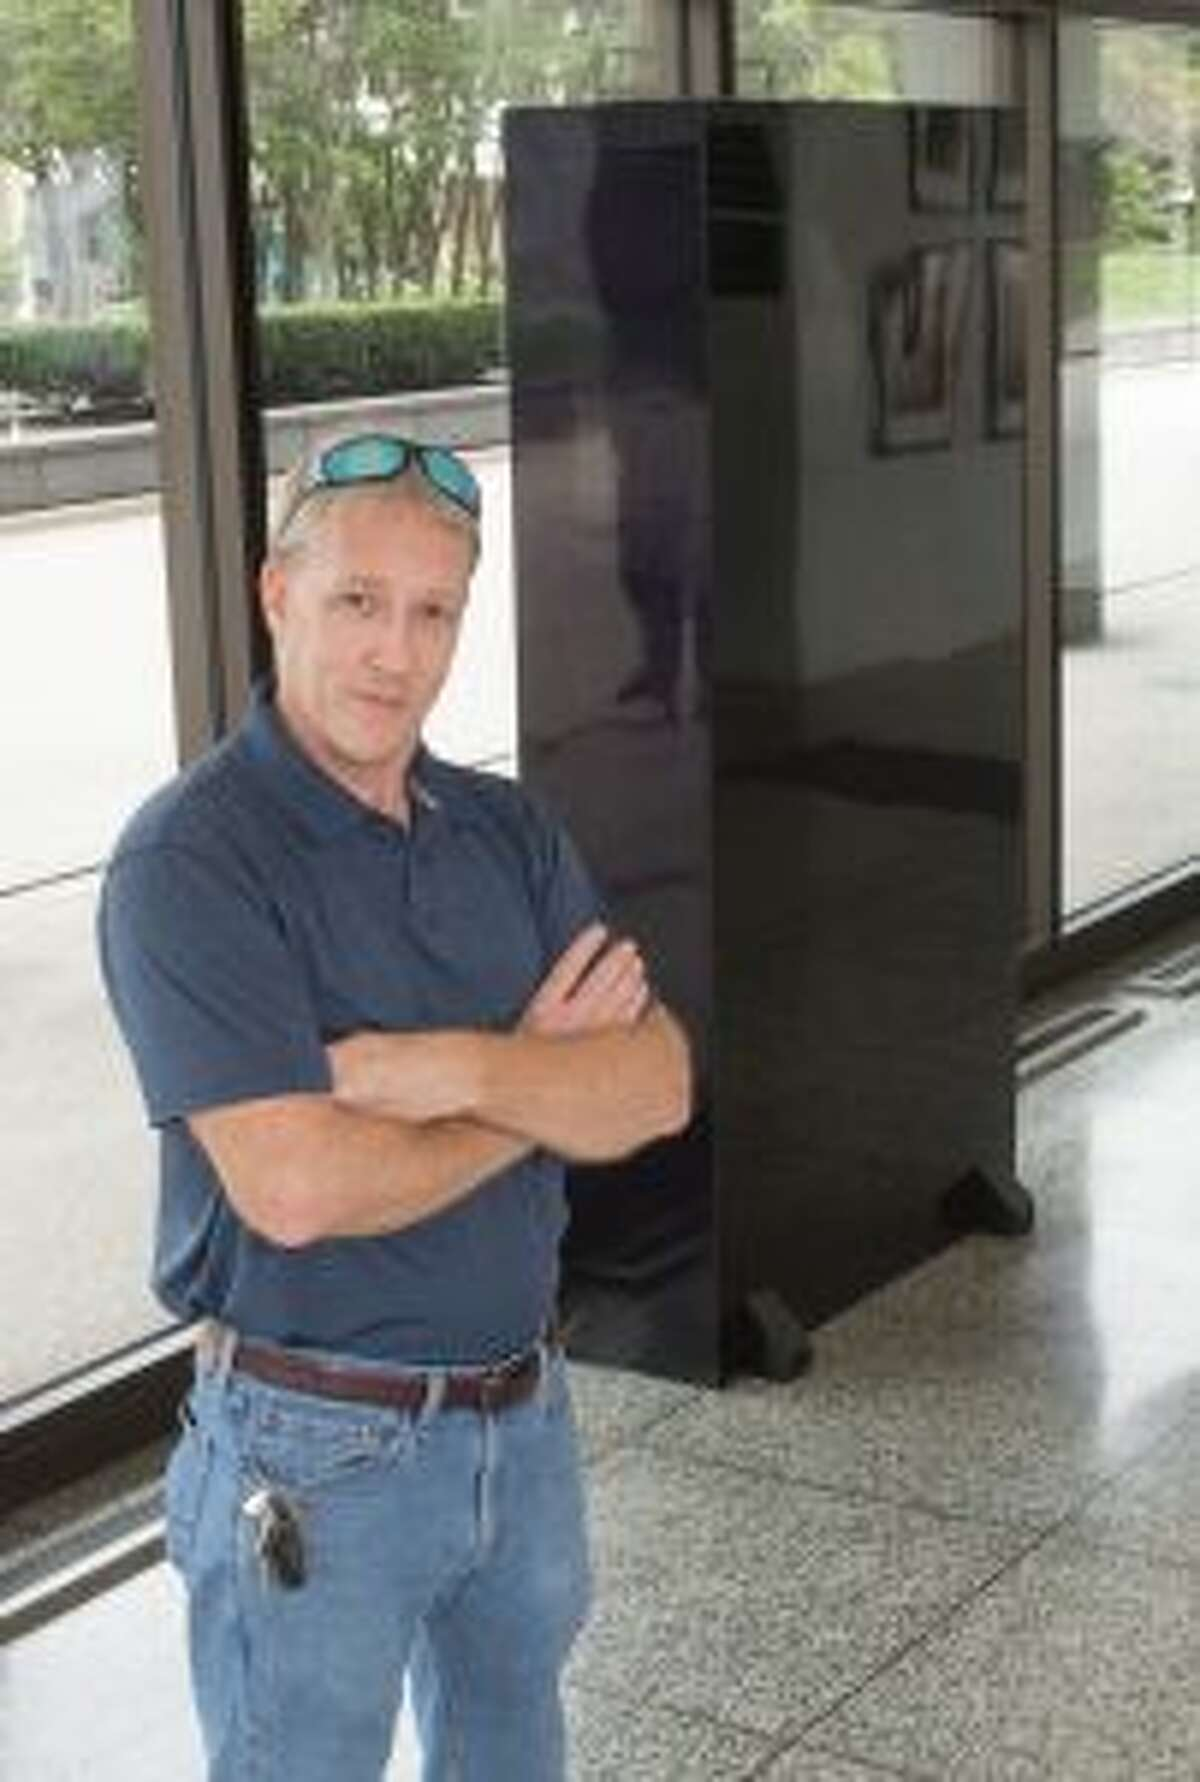 Richard Piippo, of Big Rapids, poses beside his work